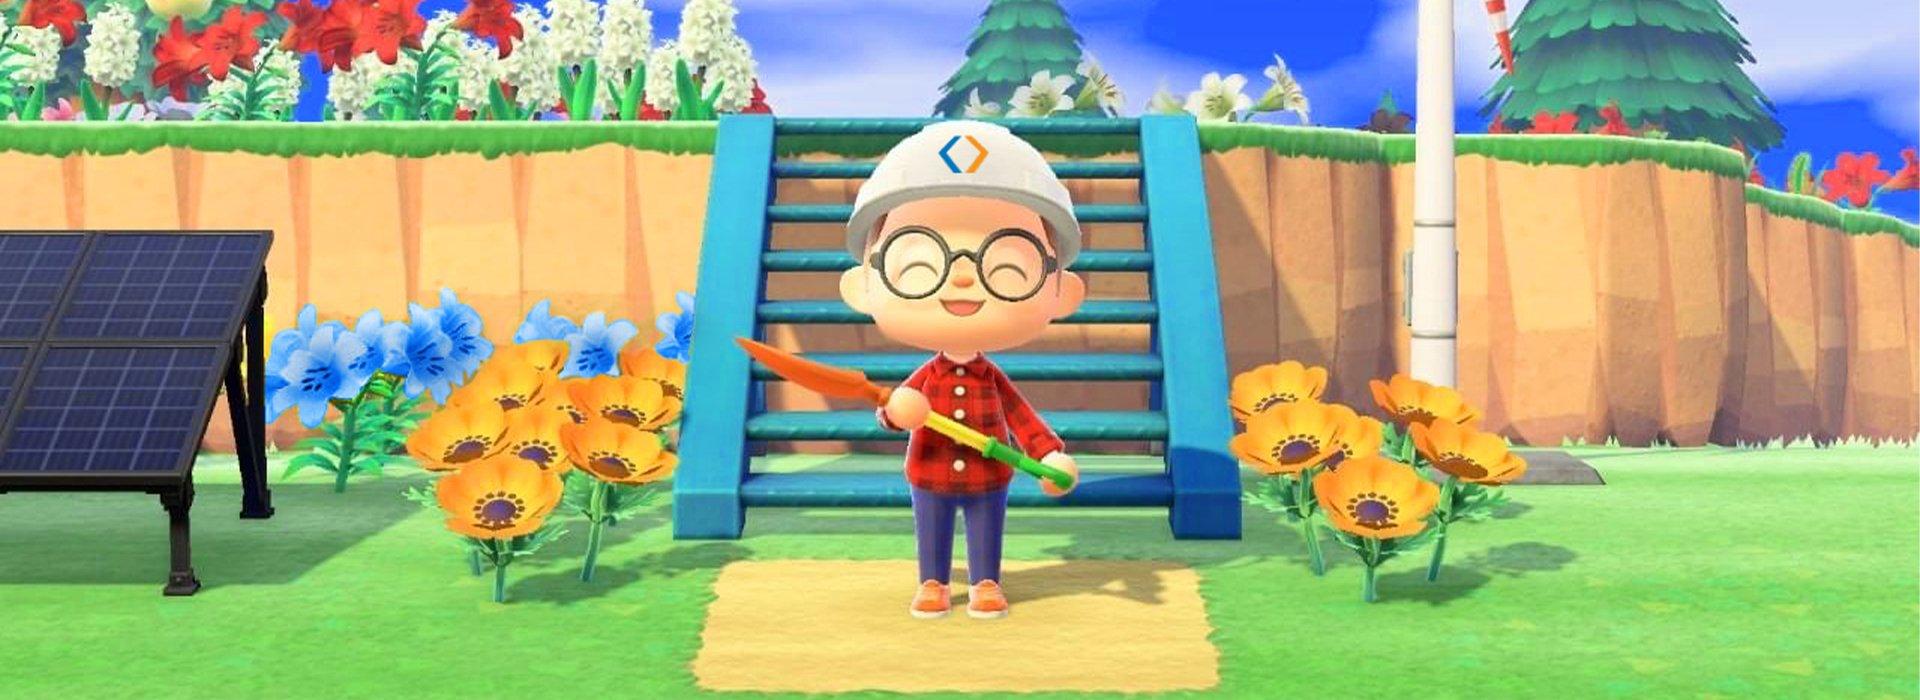 5Image: Animal Crossing: New Horizons, Nintendo EPD/Nintendo